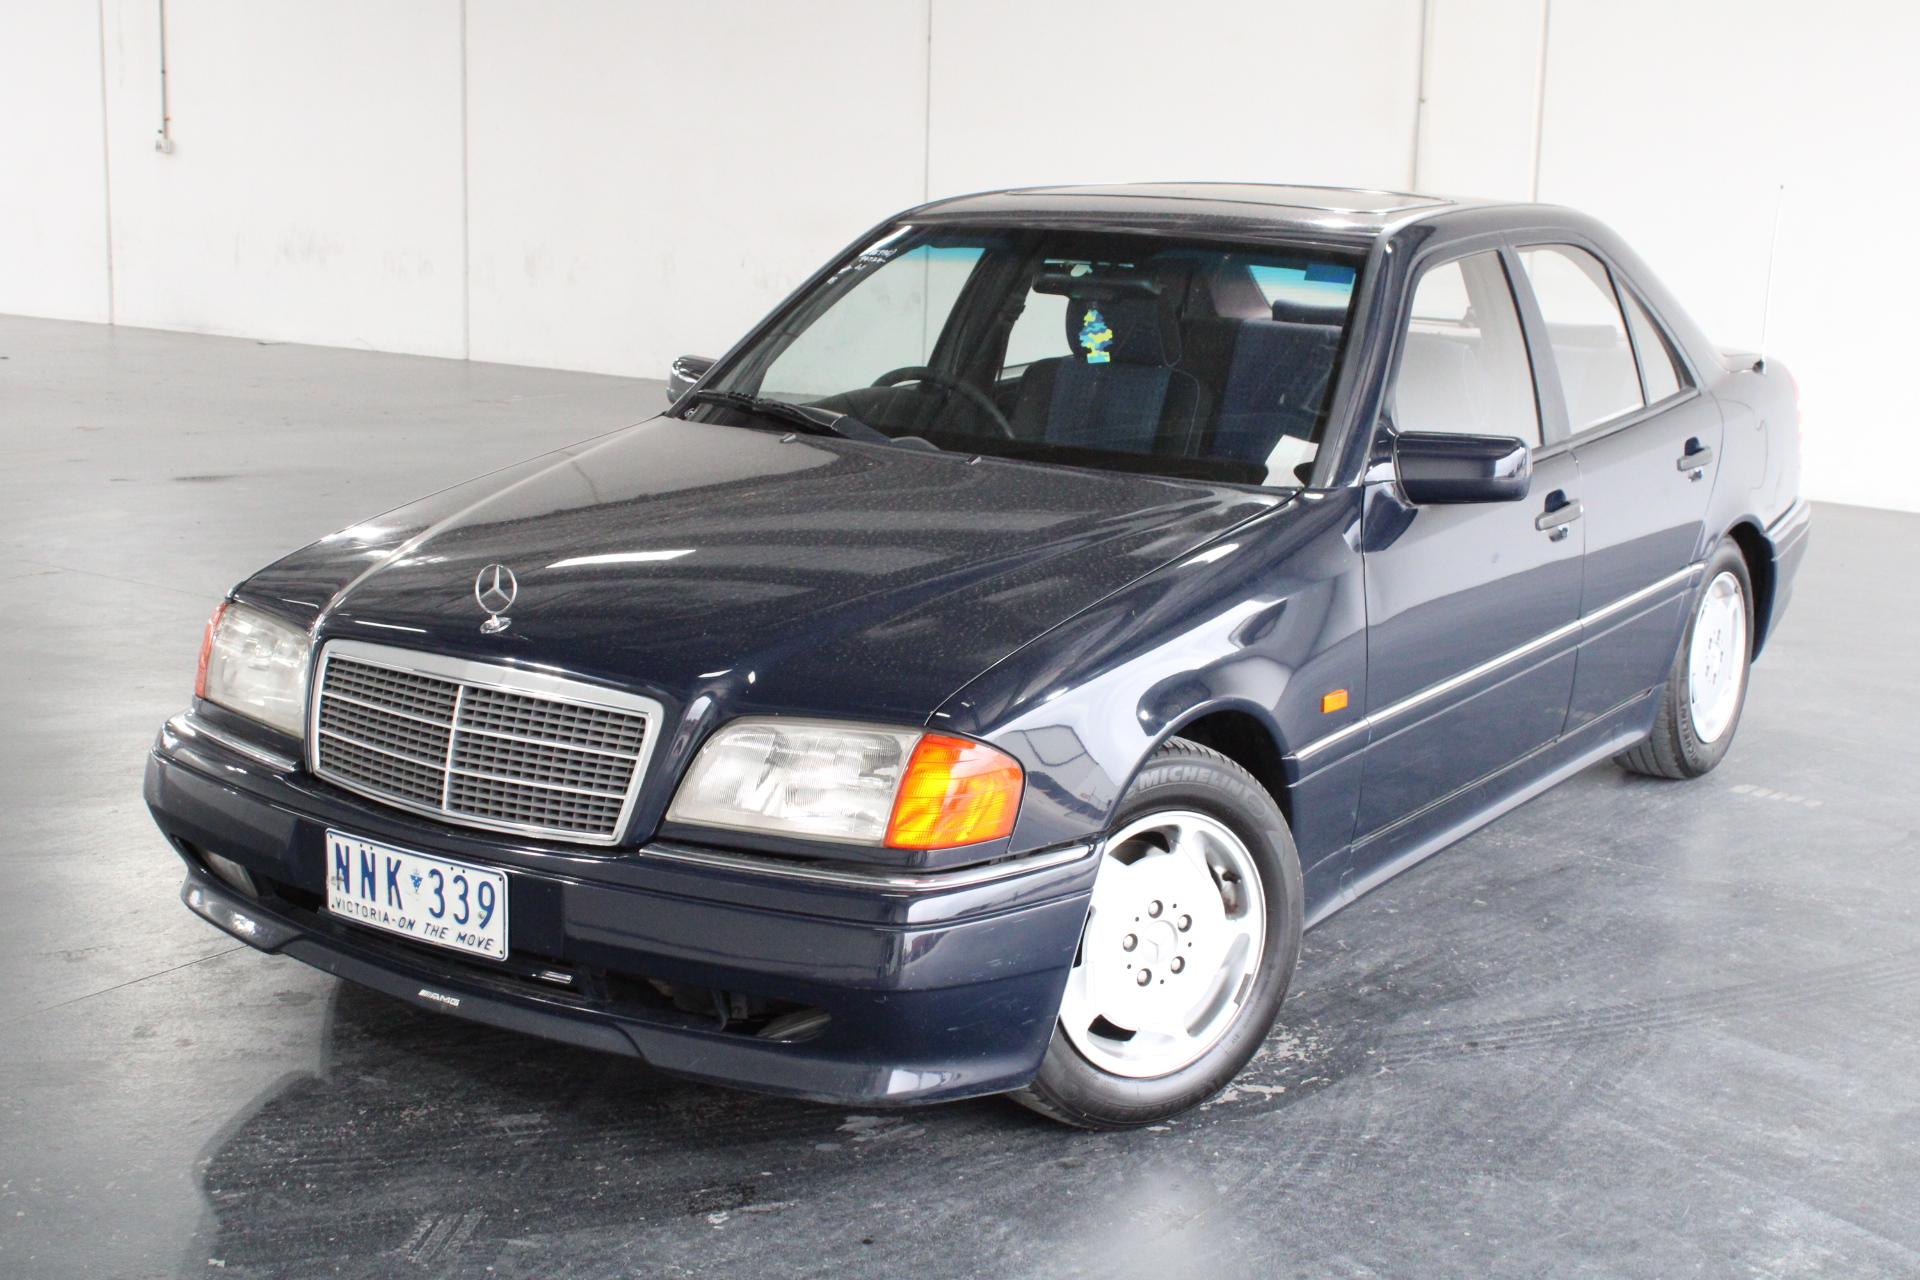 1995 Mercedes Benz C180 ESPRIT W202 Automatic Sedan